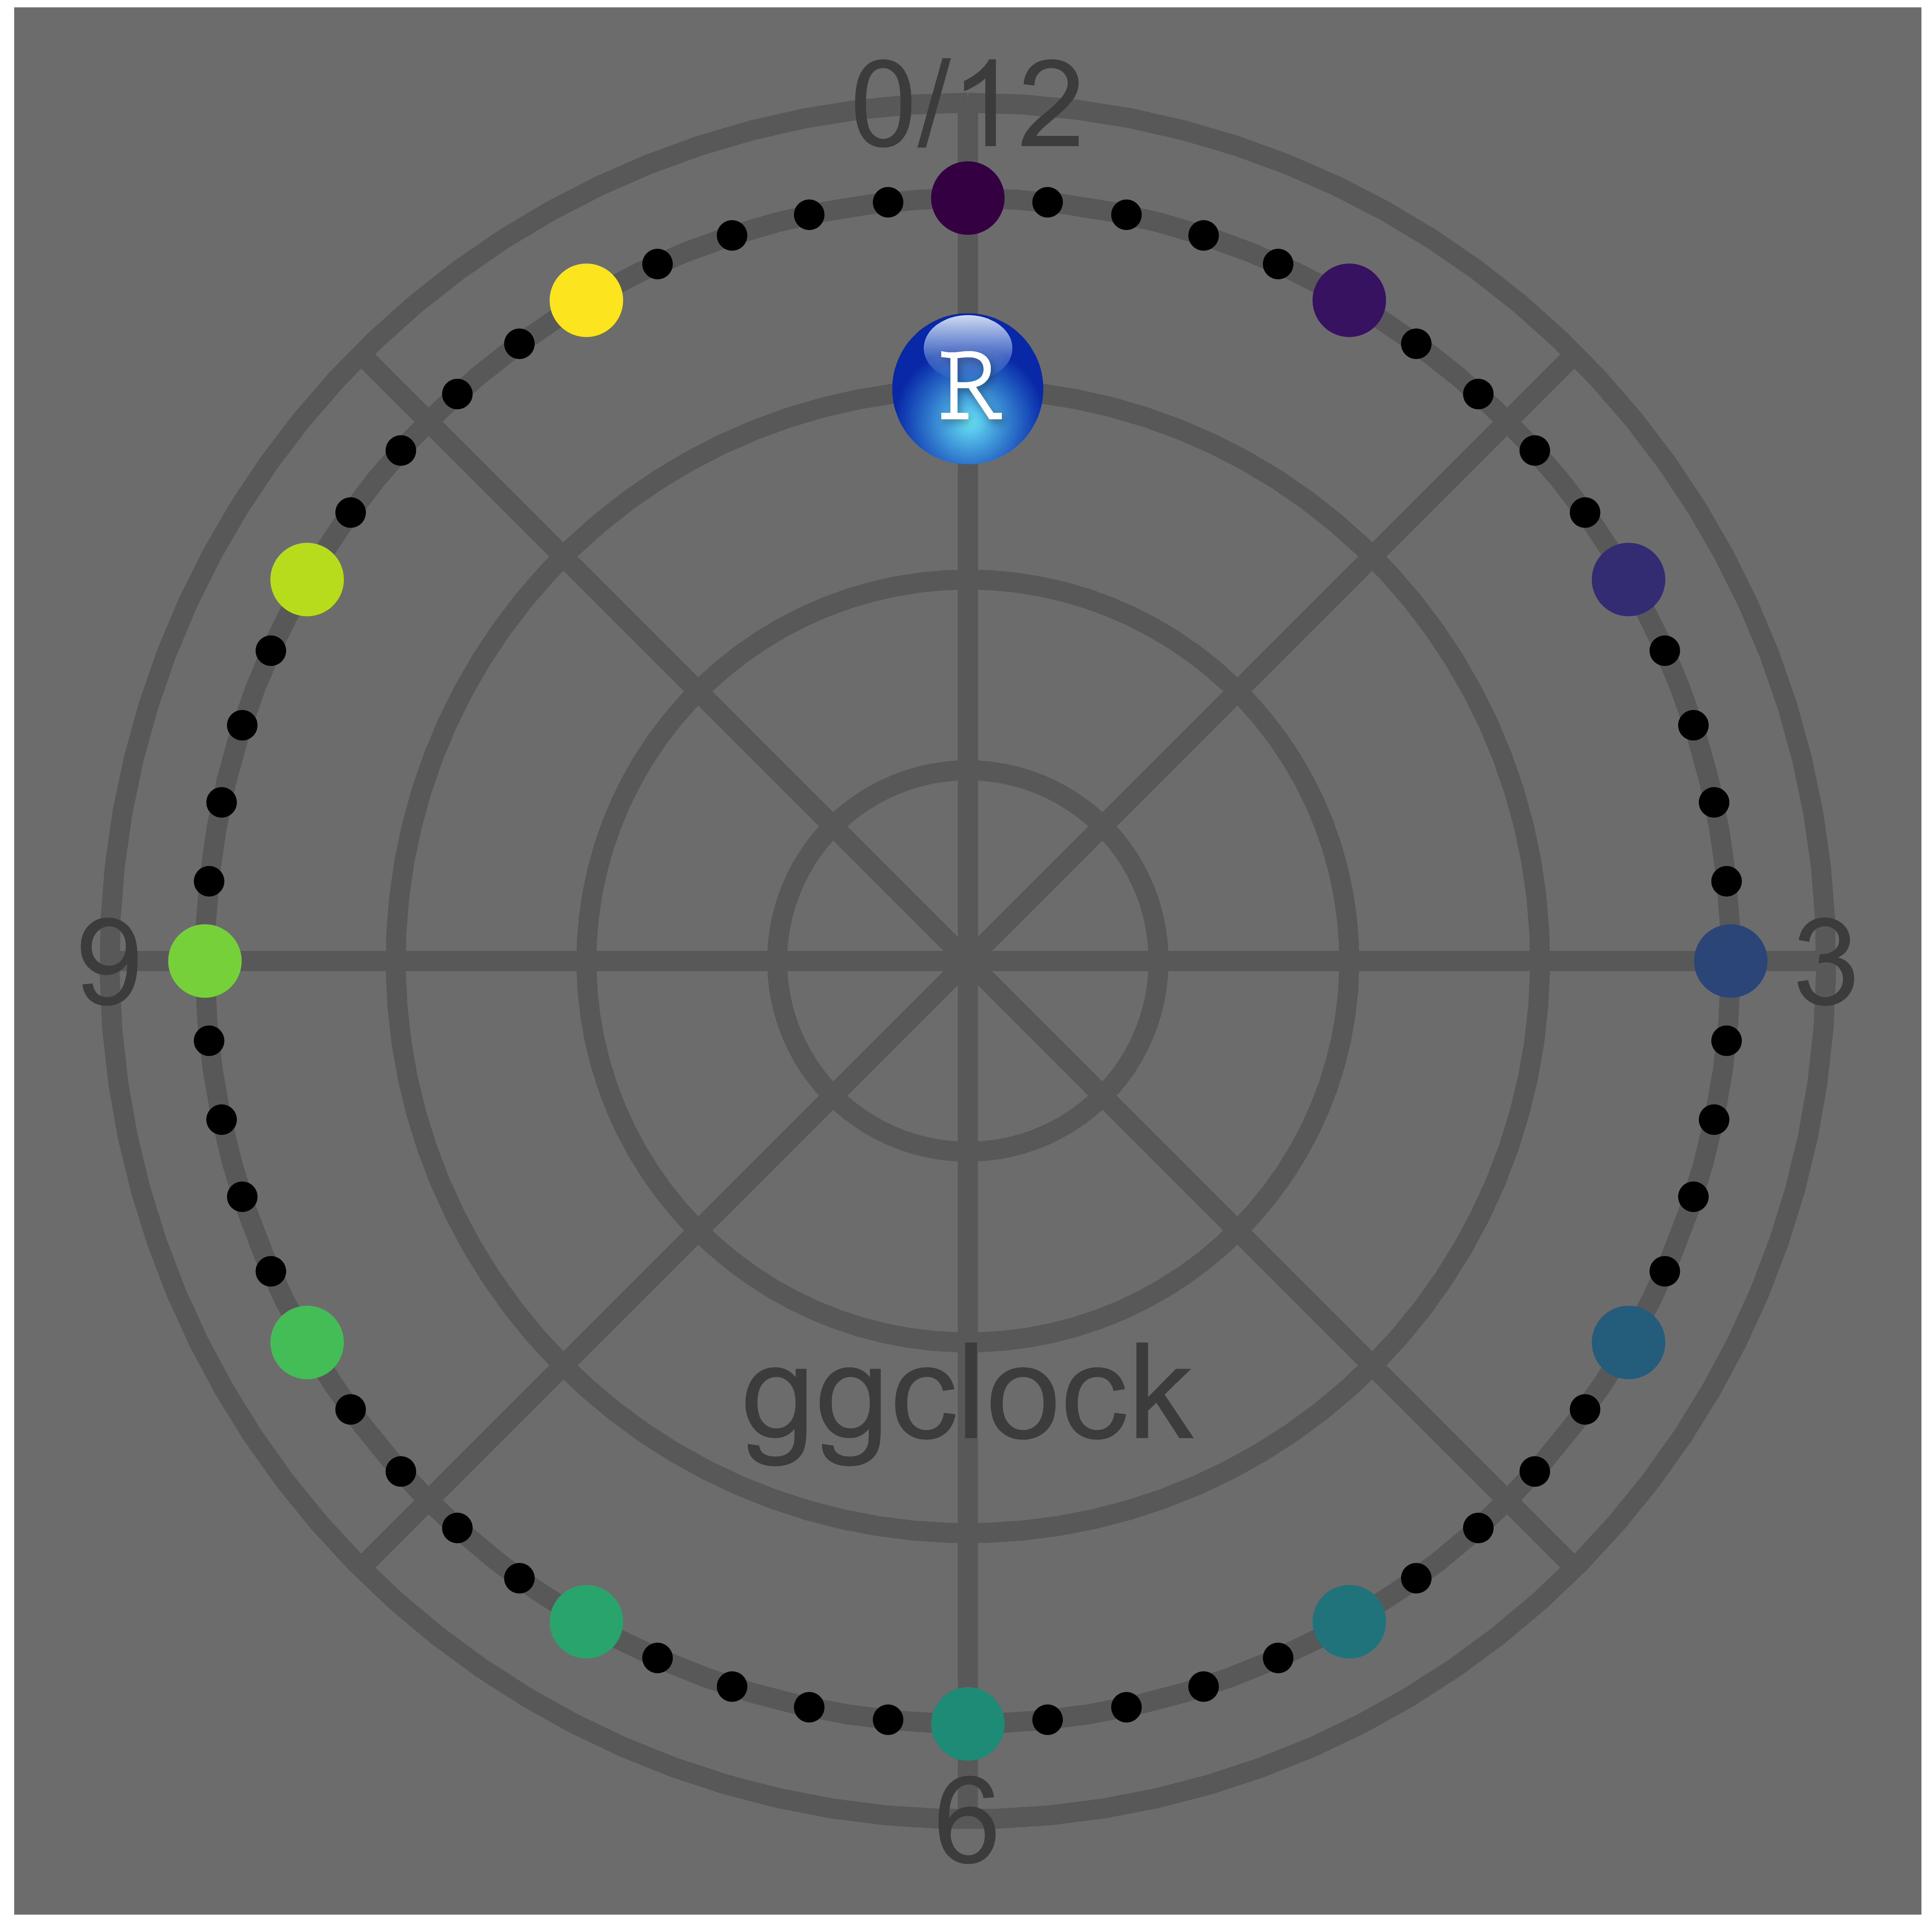 ggclock_dark